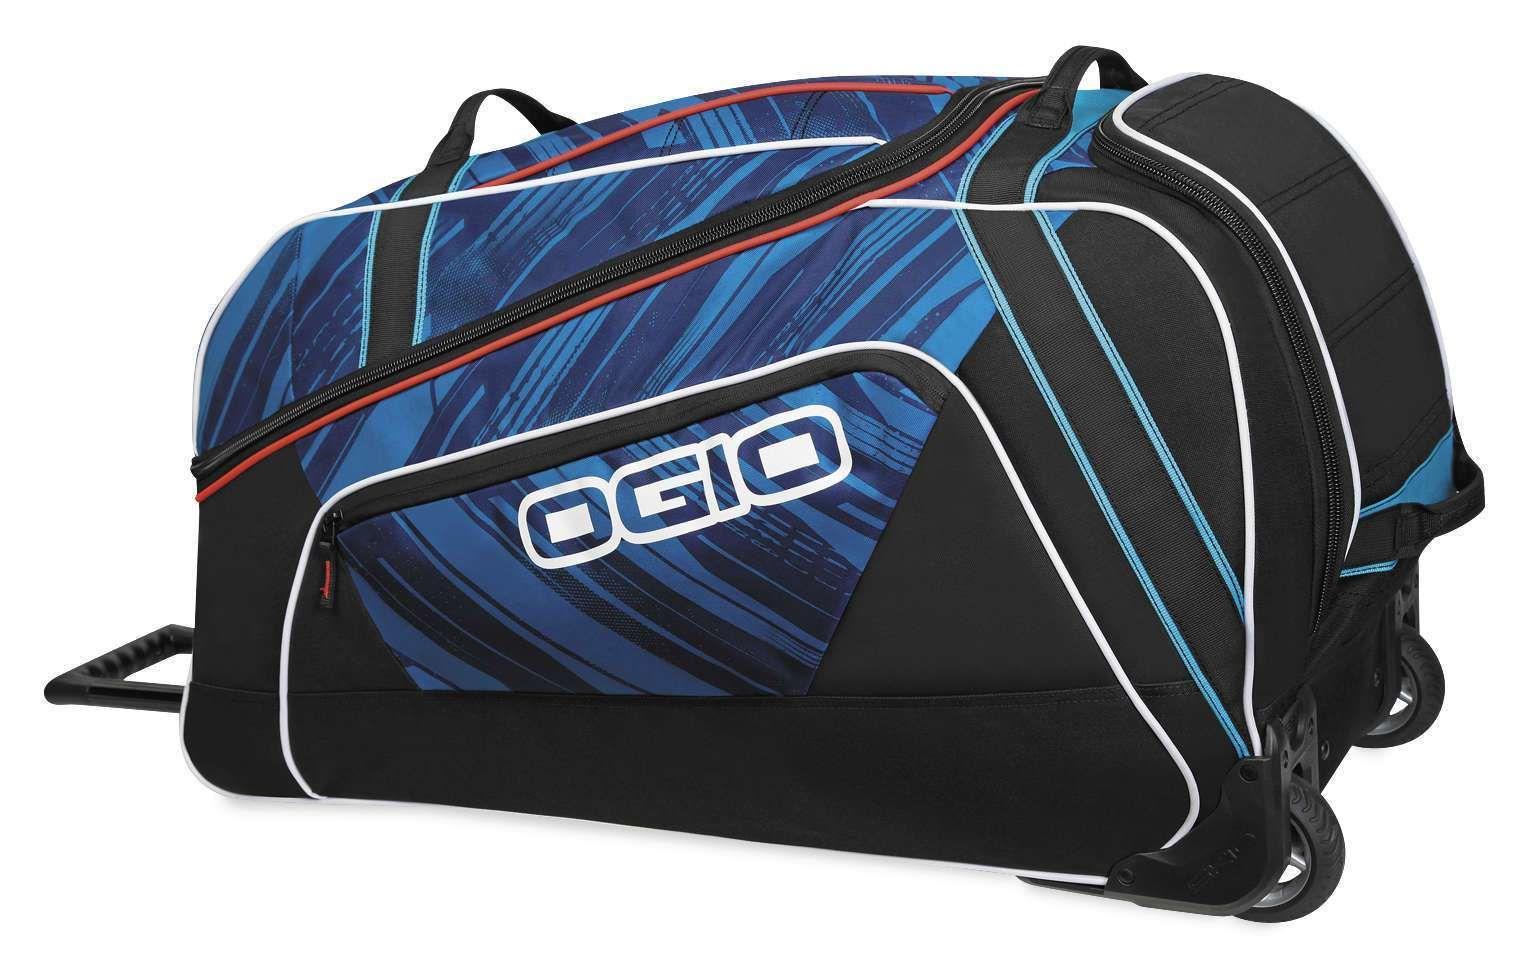 d3532fc7fde7 OGIO Big Mouth Gear Bag - Cycle Gear